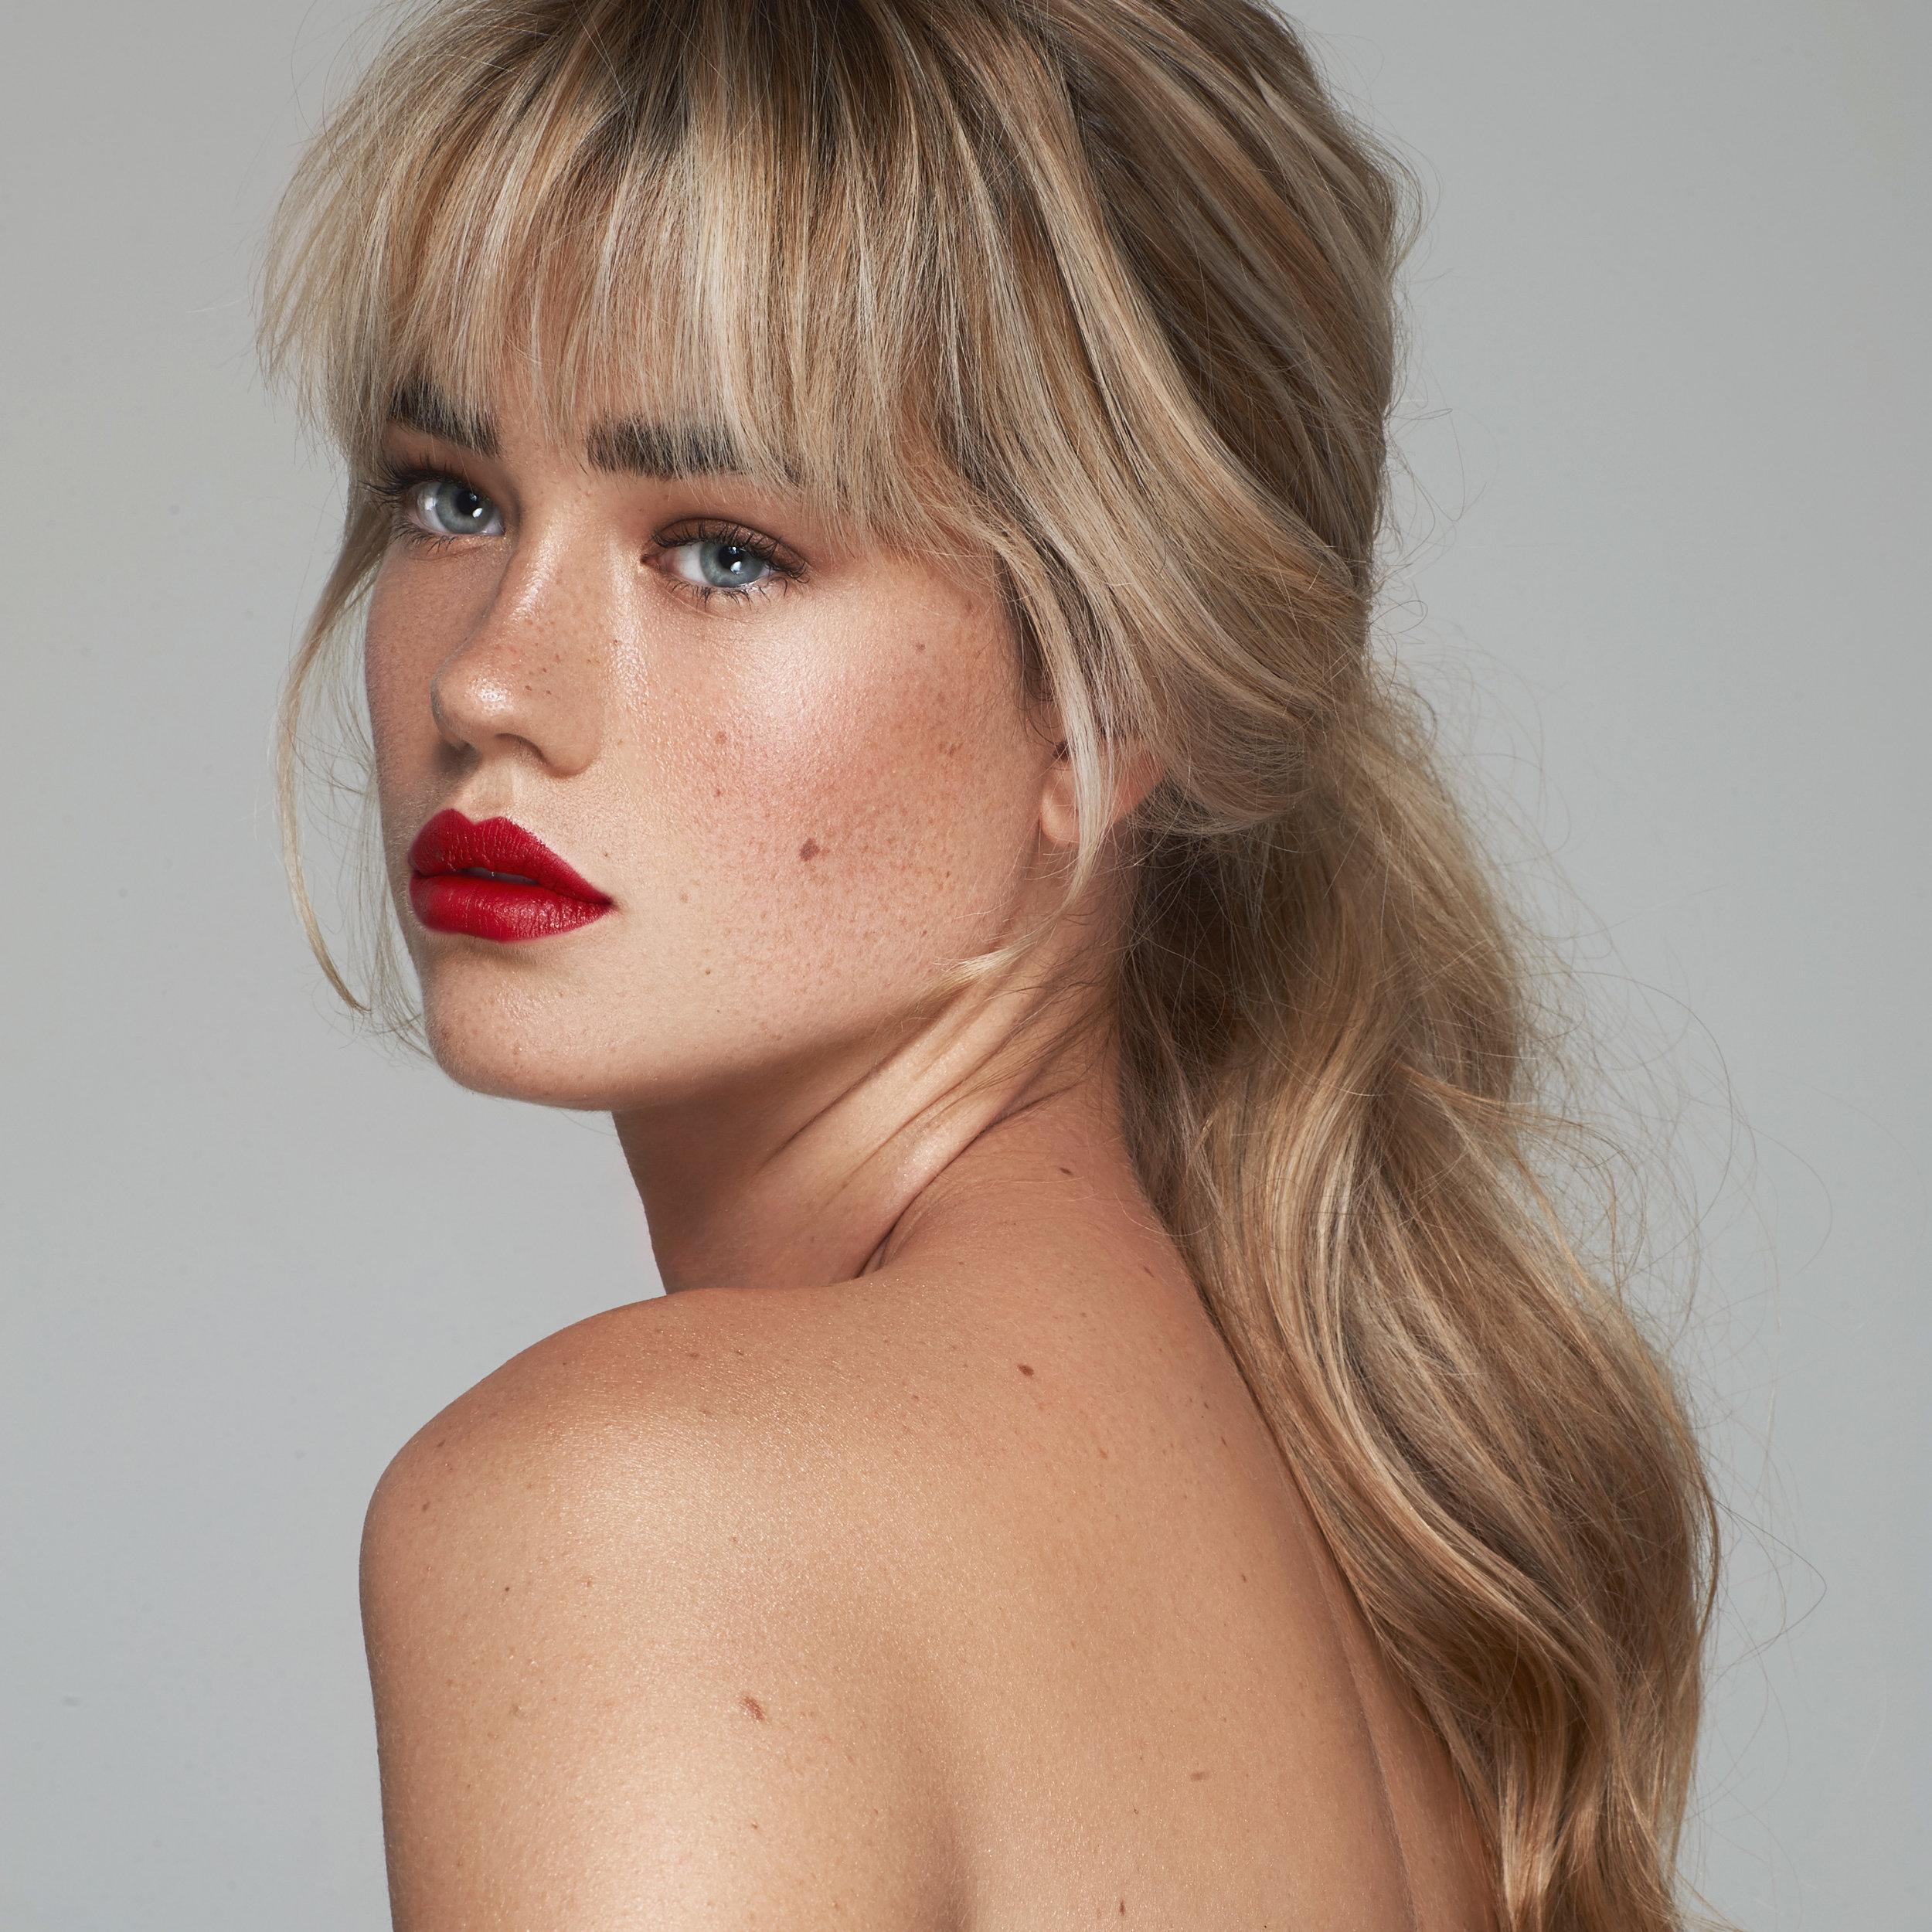 Photography by Taryn Rae Lee. Hair by Kristine Cimbule